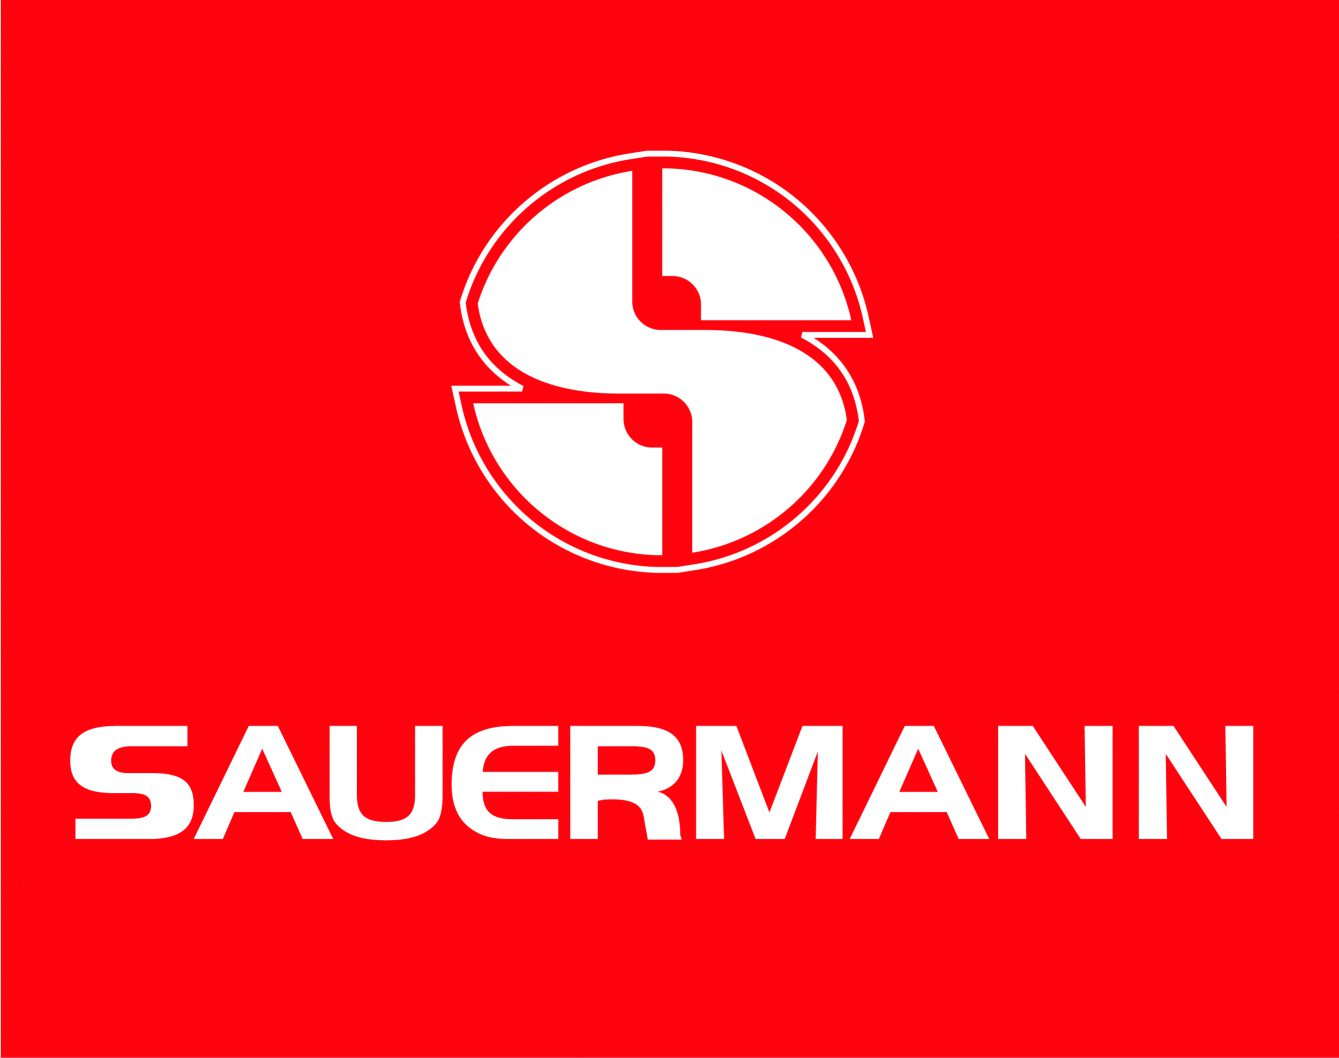 Sauermann-Referenzkunde-AlphabeltsVQZyILdTbXaG